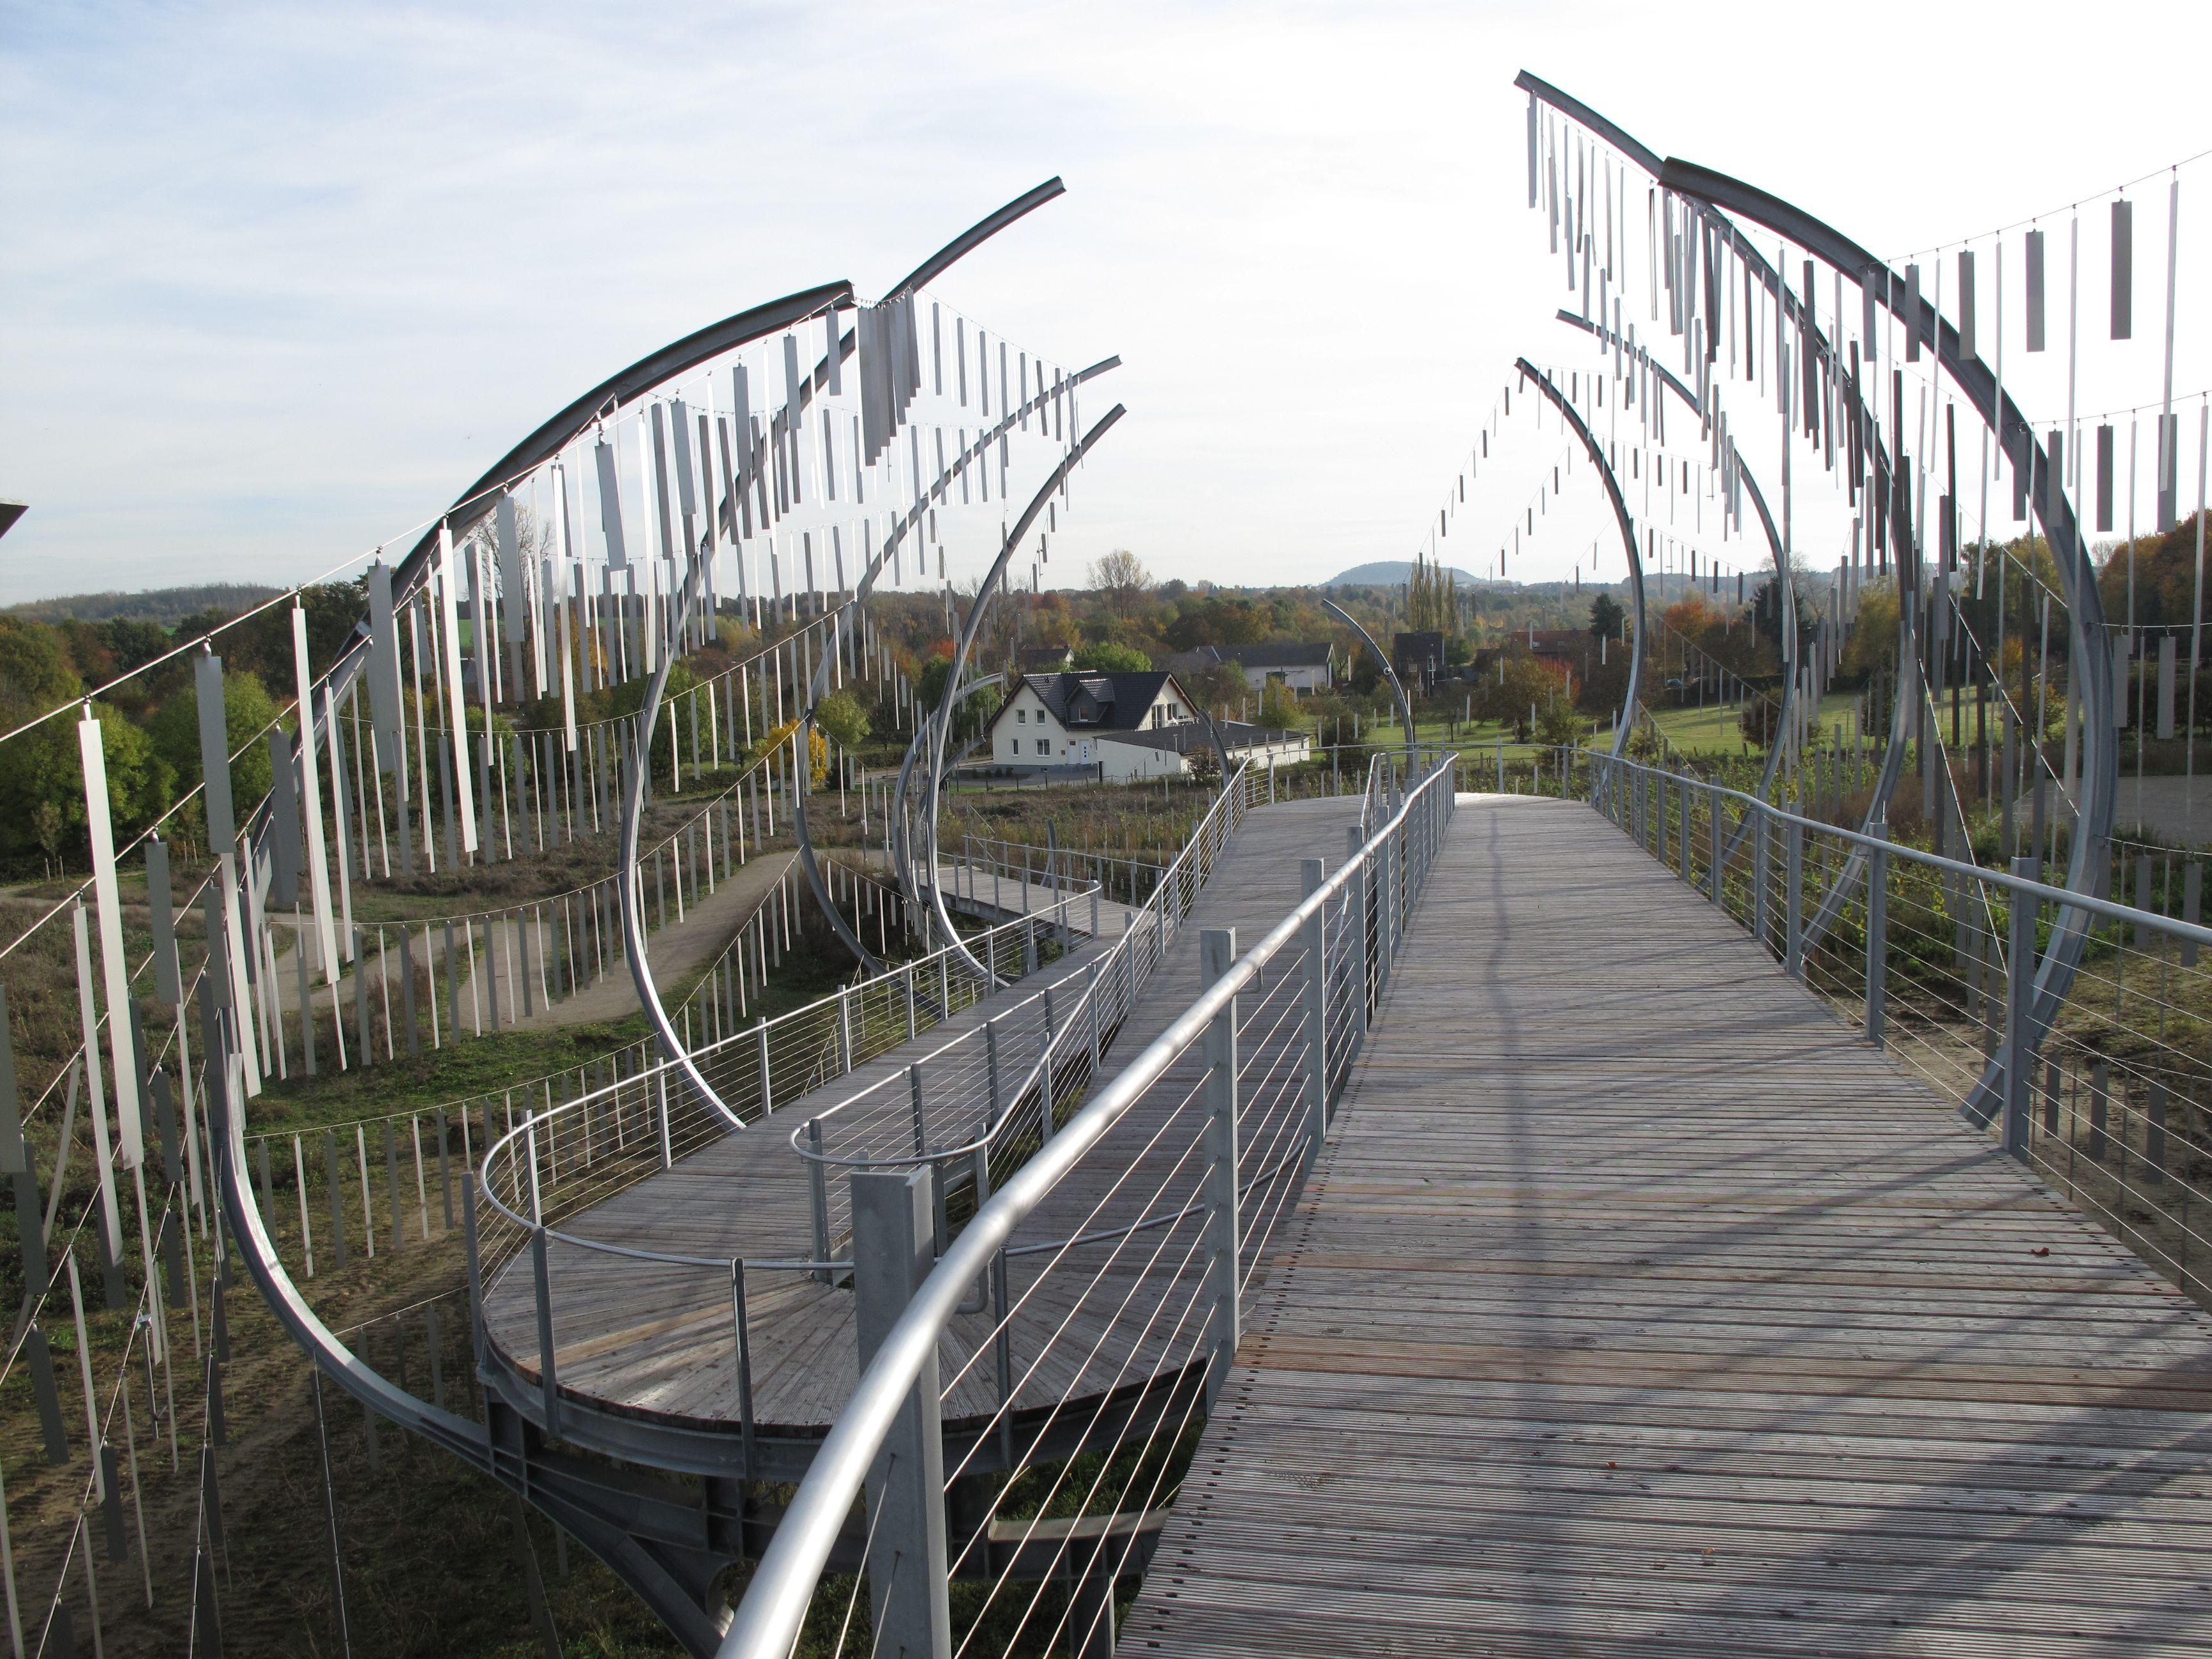 nox - wind chimes bridge | Awesome architecture | Pinterest | Bridge